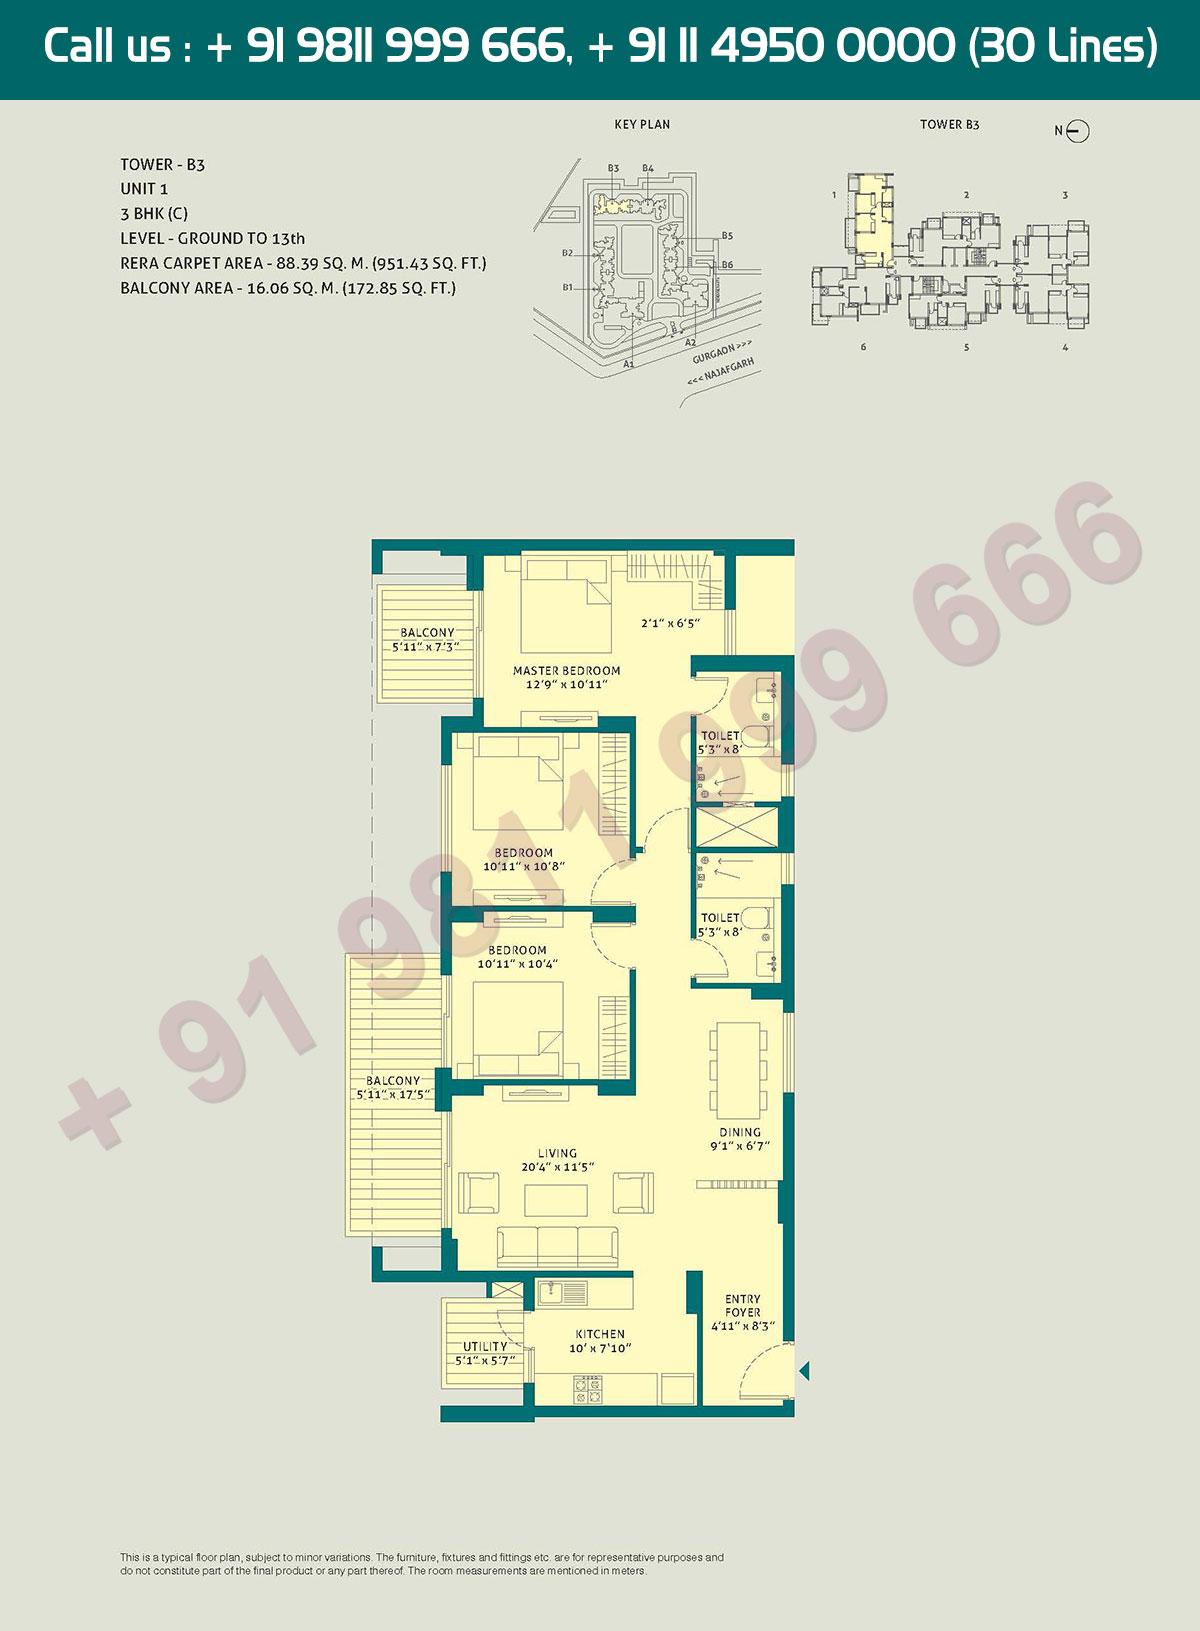 3 BHK - (C), Level Ground to 13,Unit - 1, Tower - B3